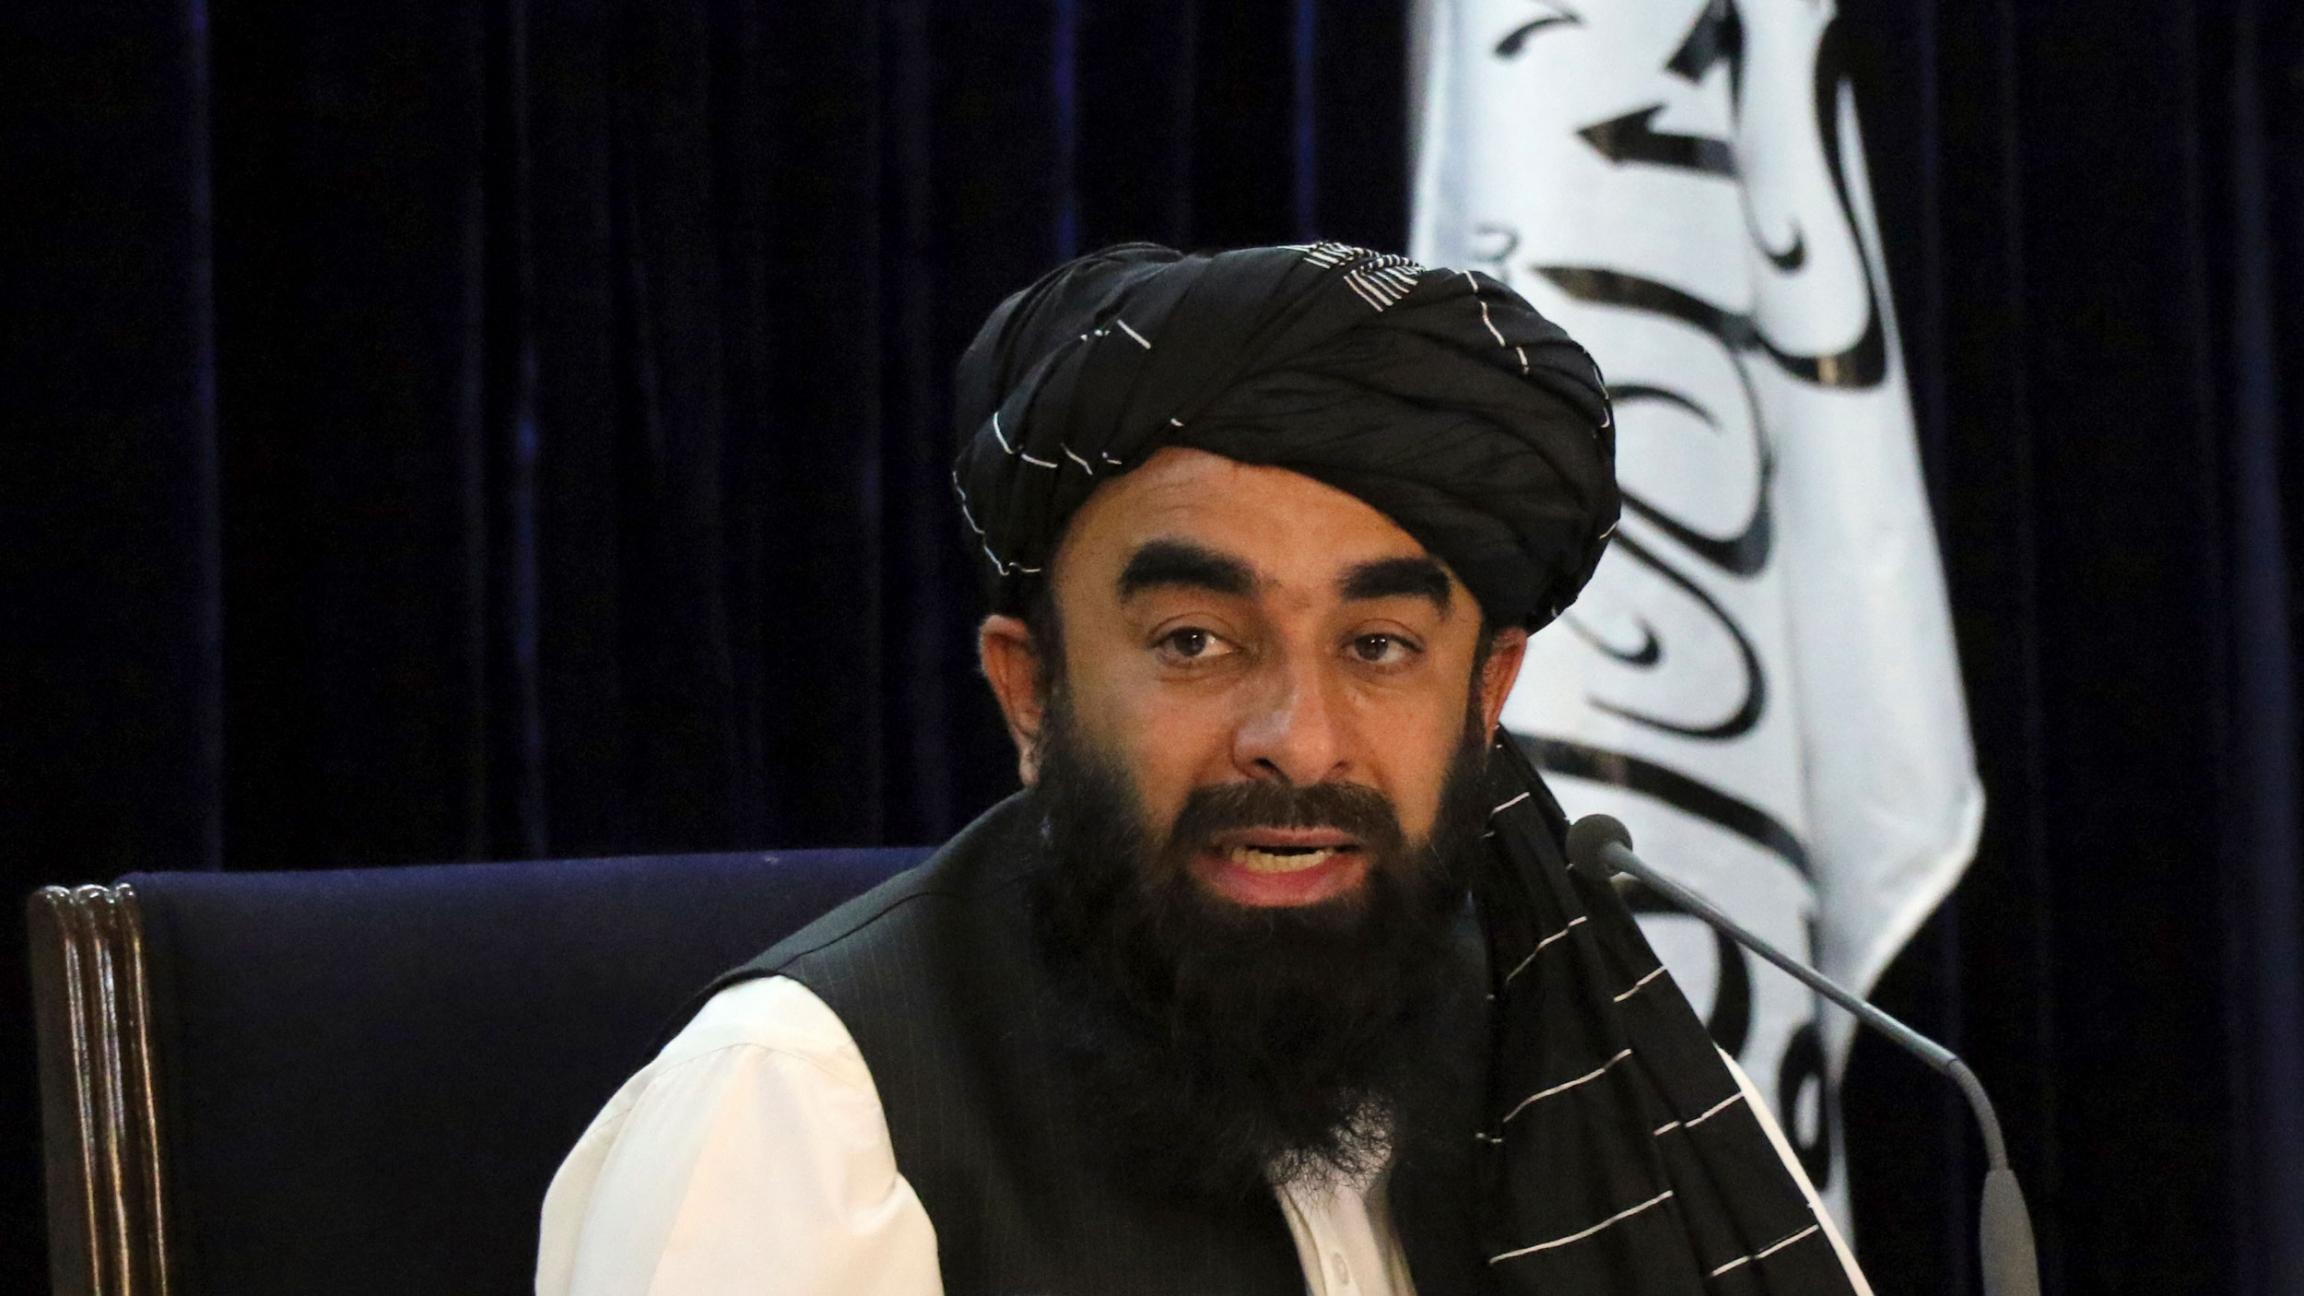 Taliban spokesman Zabihullah Mujahid is shown sitting while wearing a dark head wrap and black vest with the Taliban flag behind him.